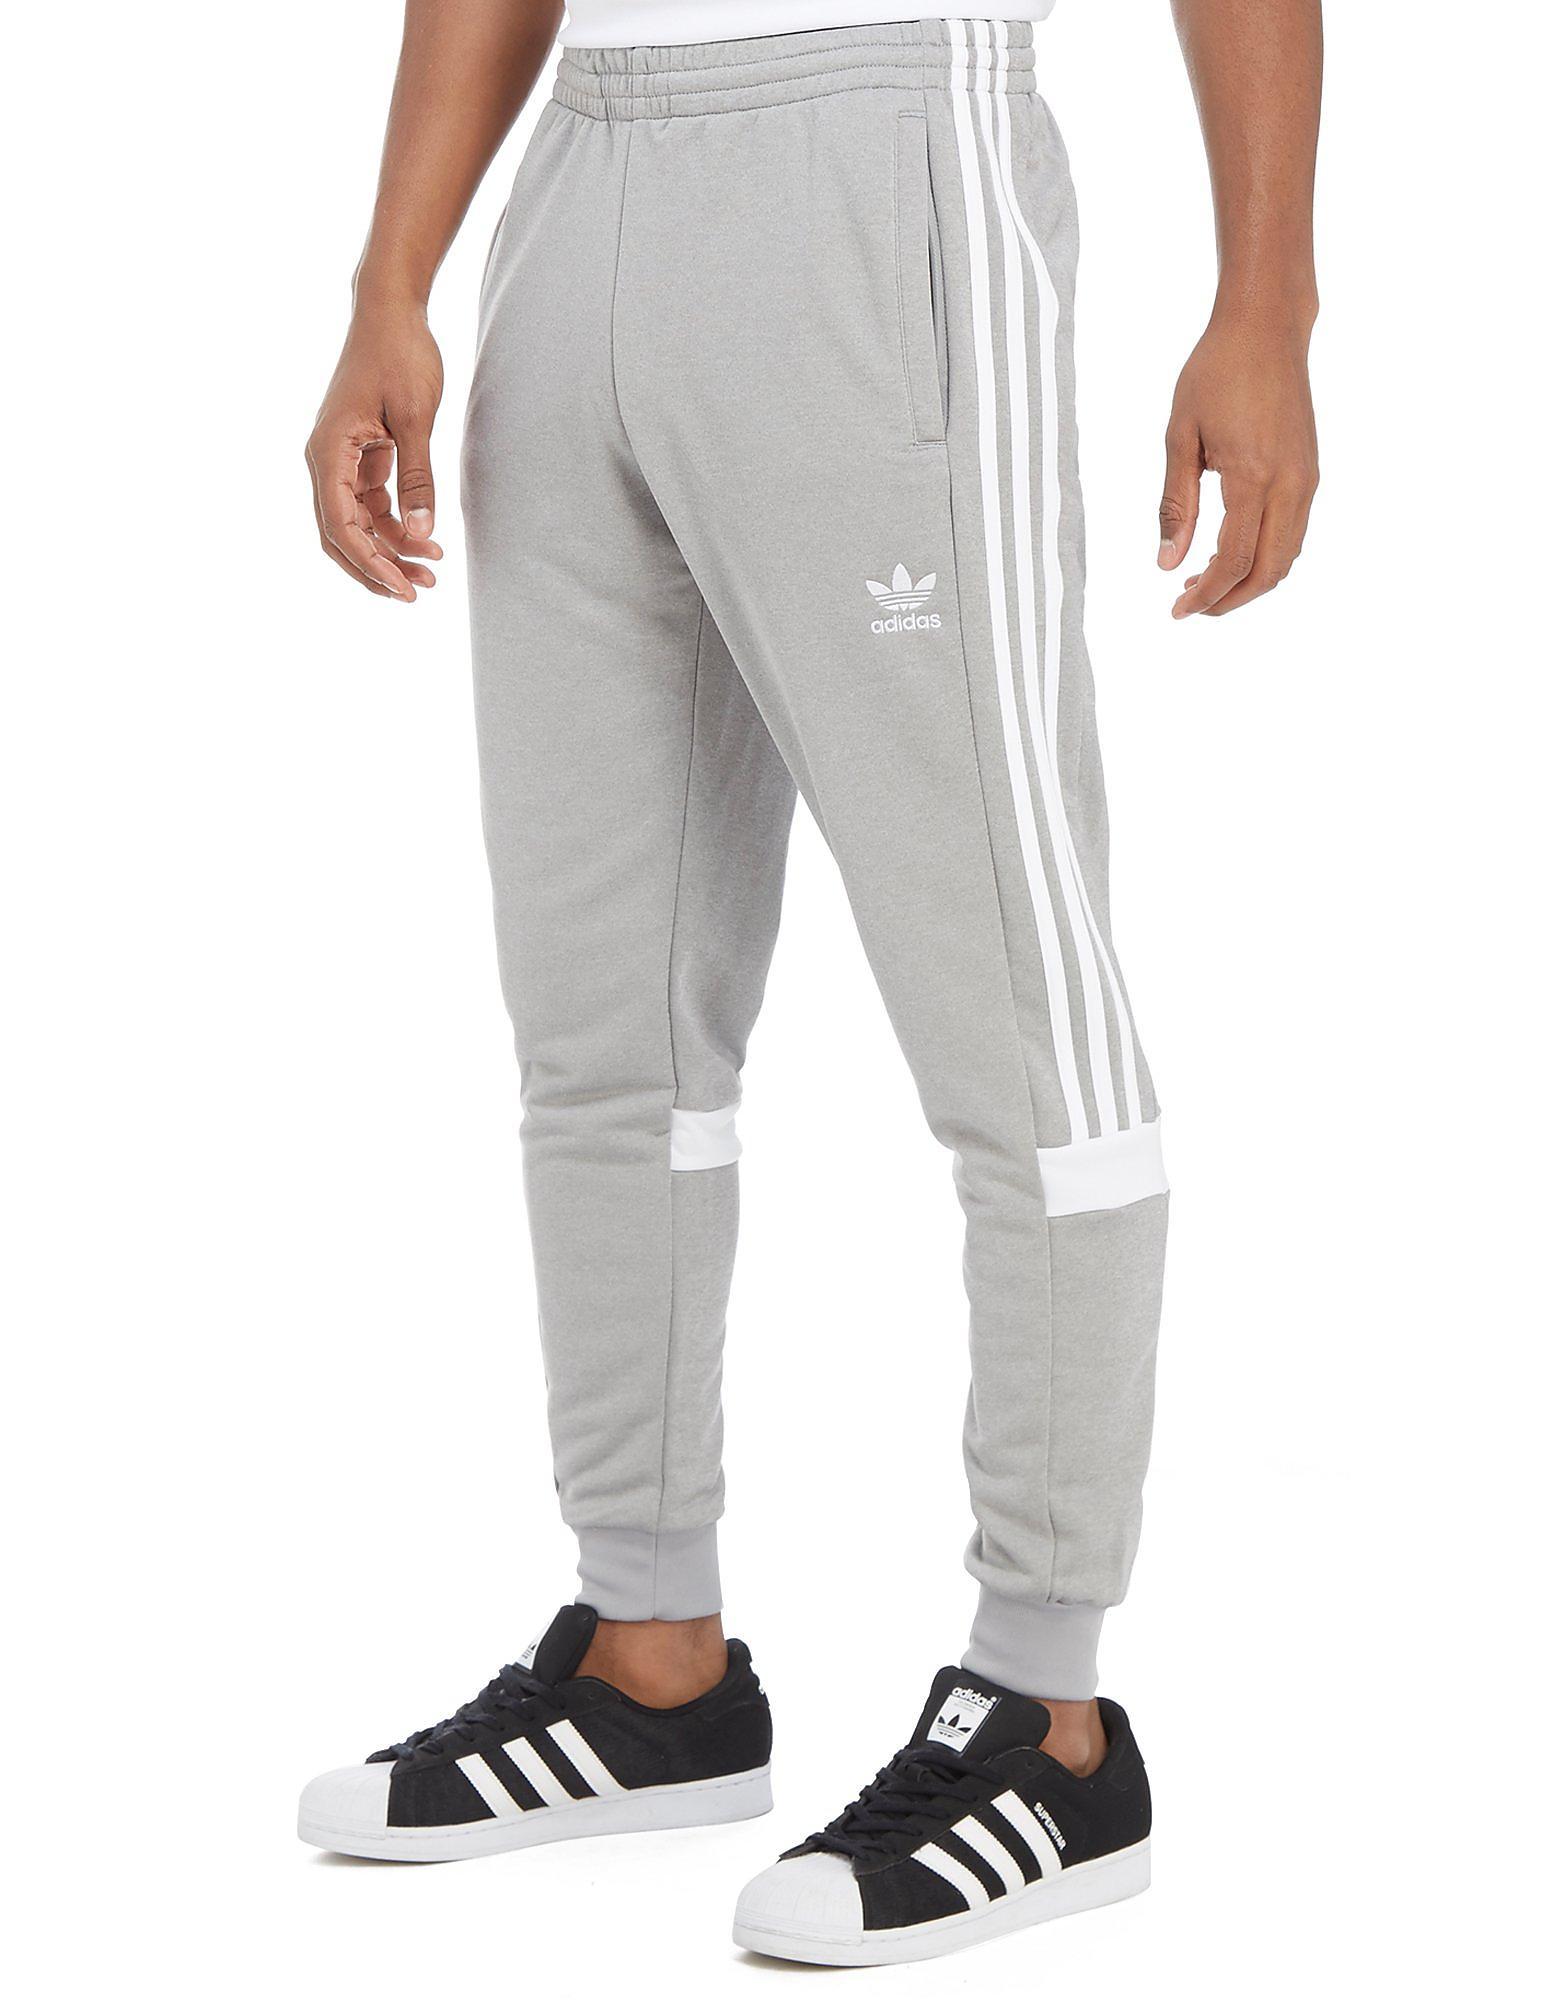 adidas Originals Superstar Colourblock Pants Heren